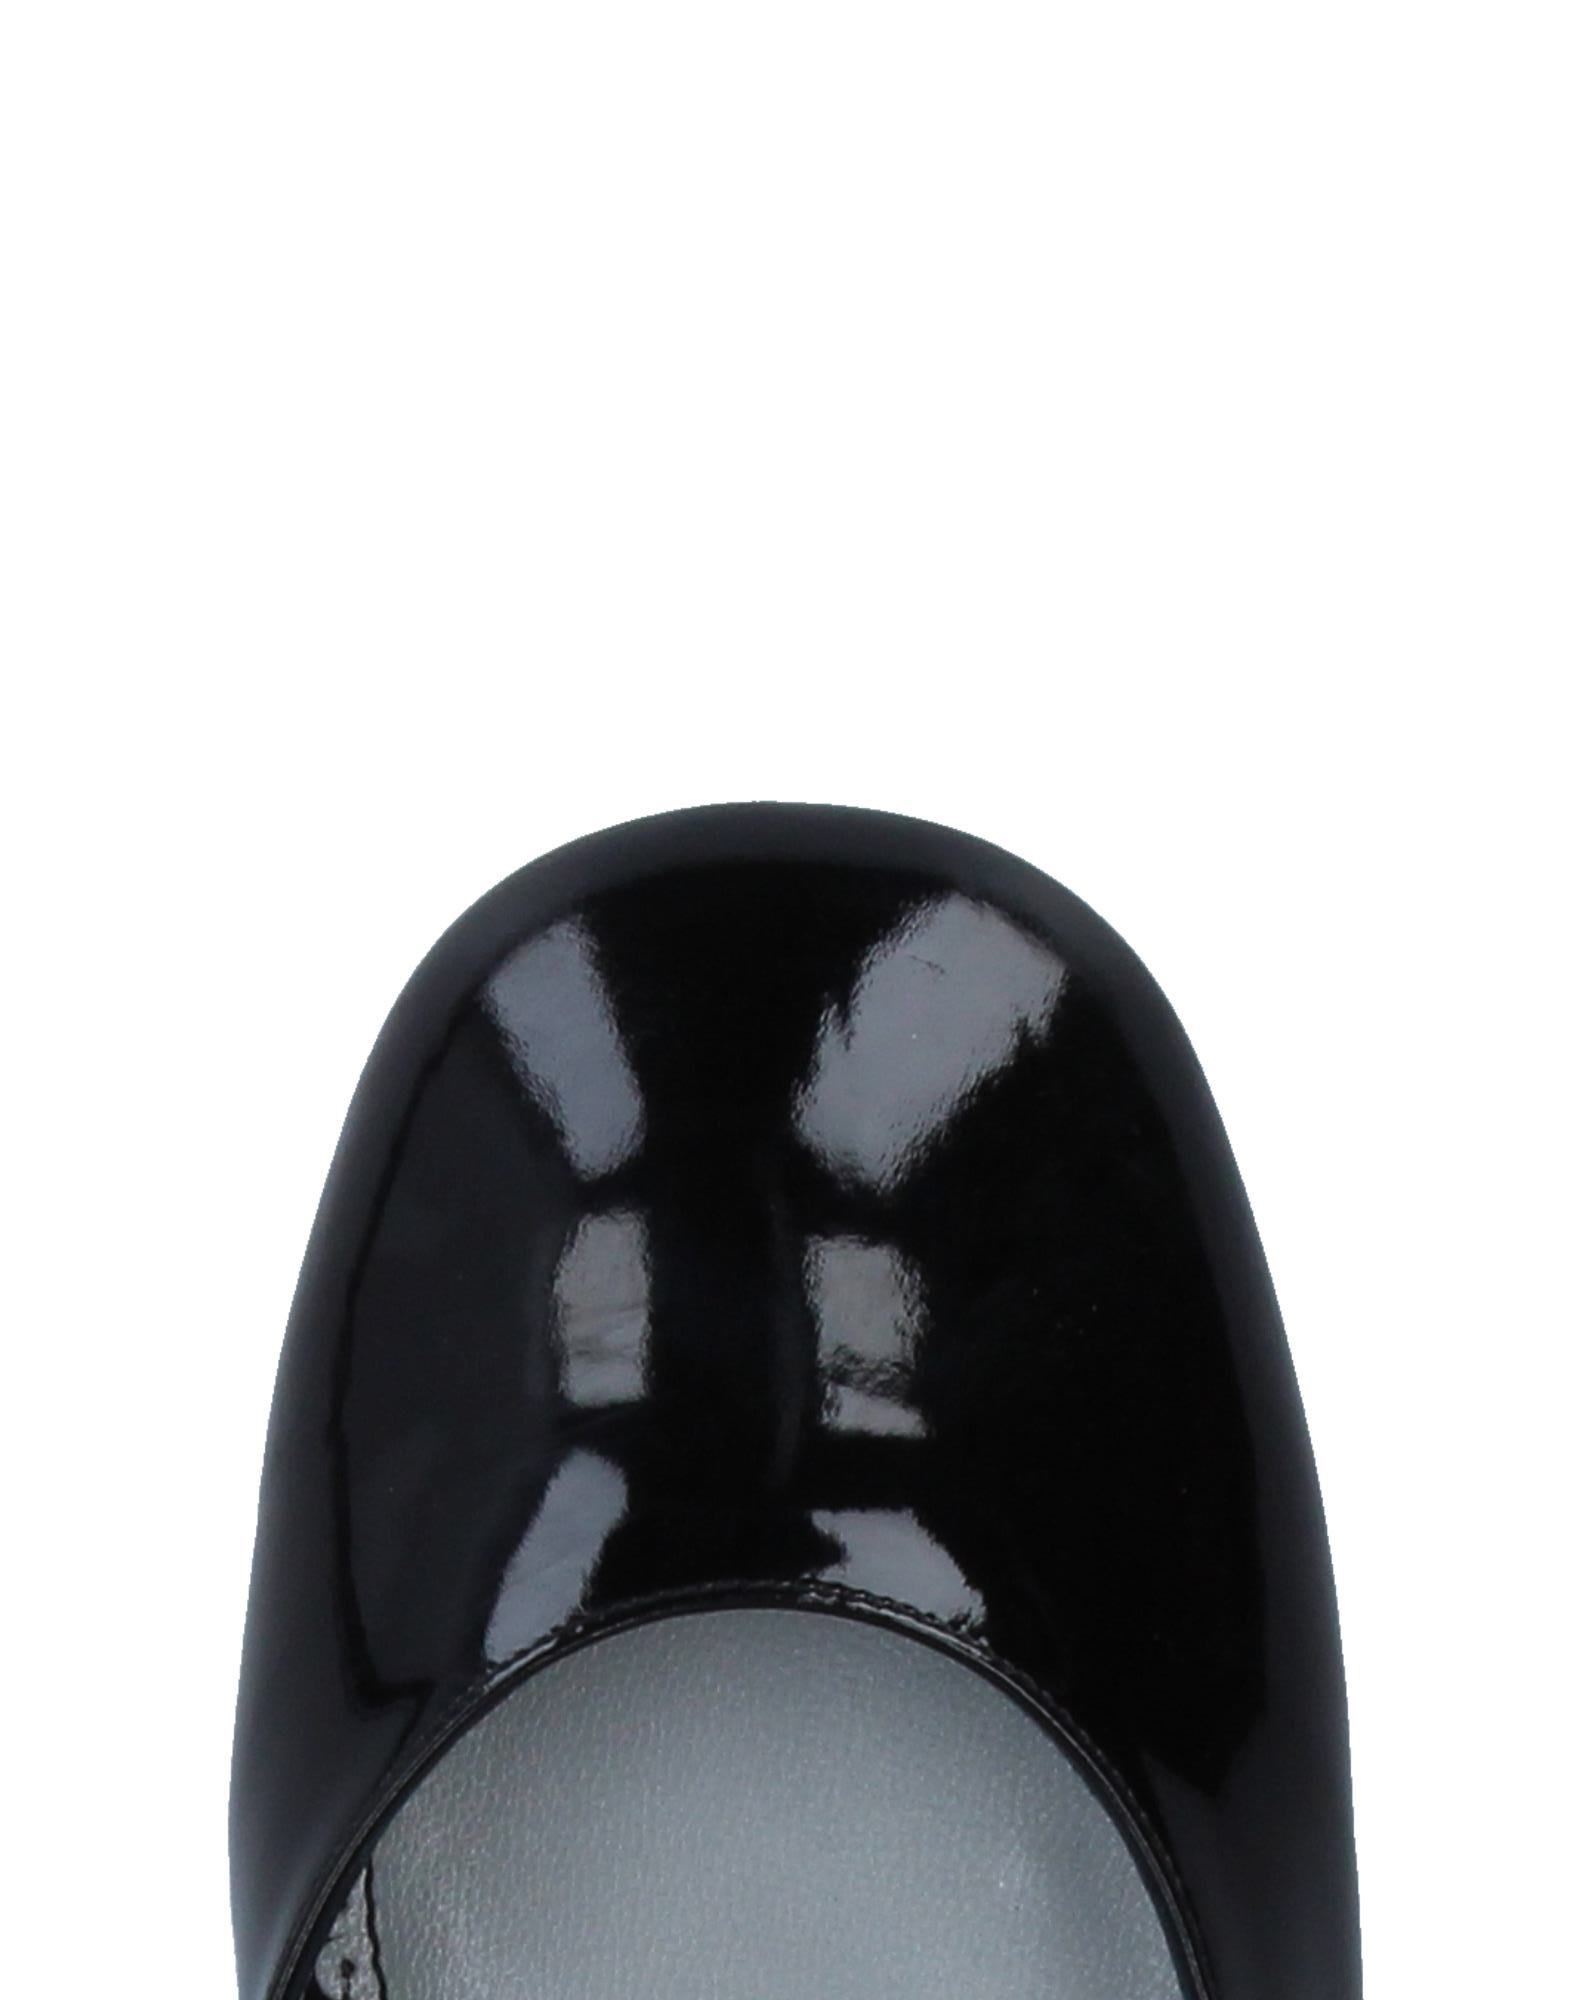 Stilvolle billige Schuhe Damen Rayne Pumps Damen Schuhe  11324550CA 2592c4